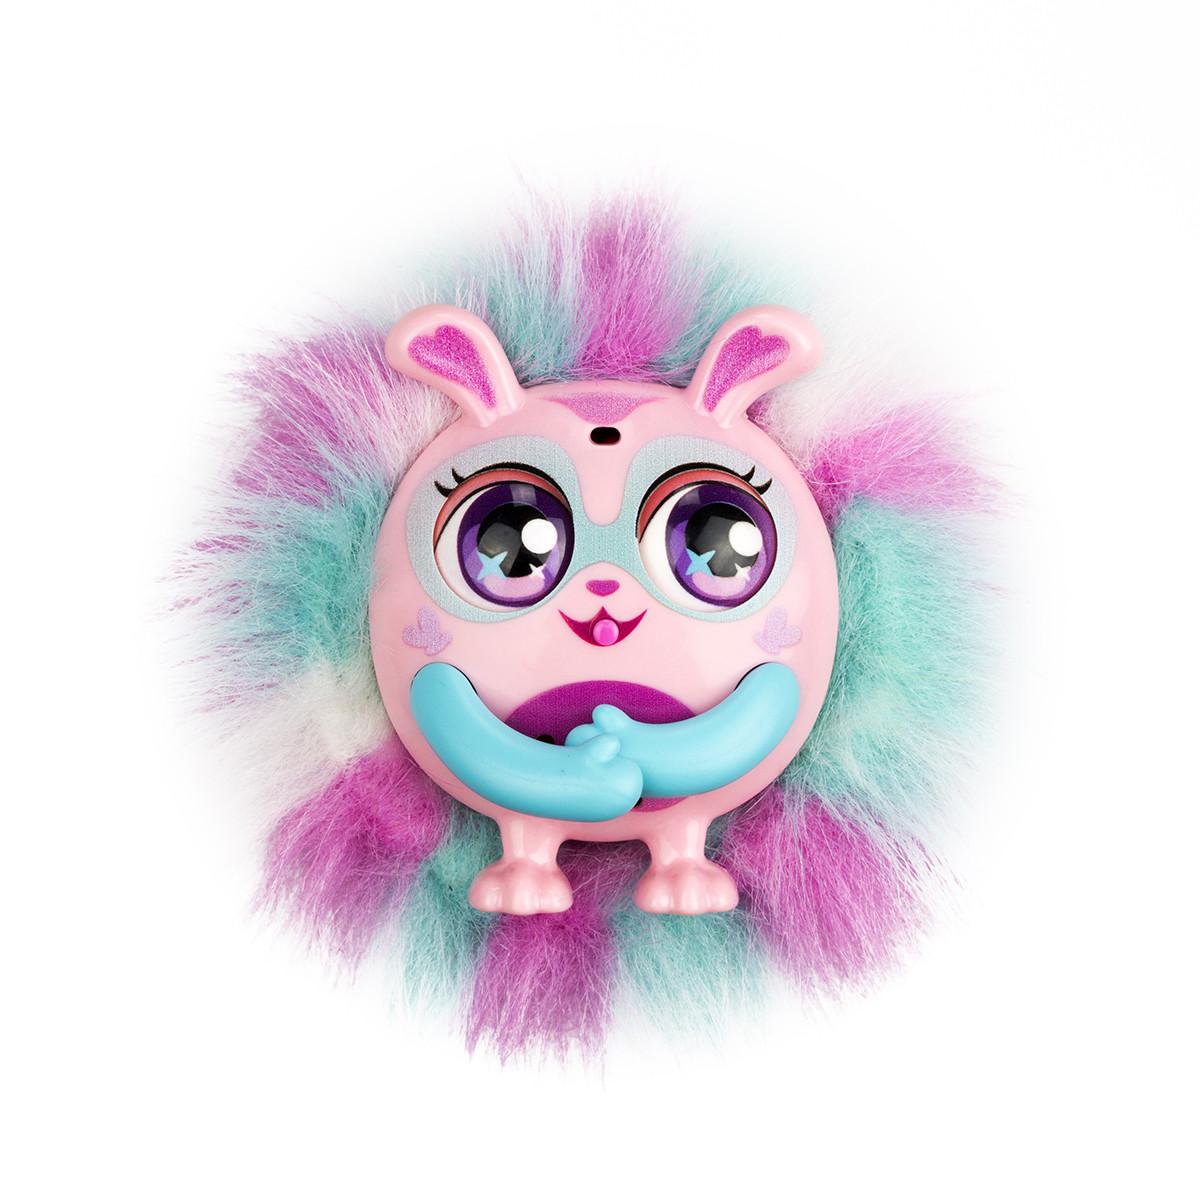 Интерактивная Игрушка Tiny Furries – Пушистик Айви